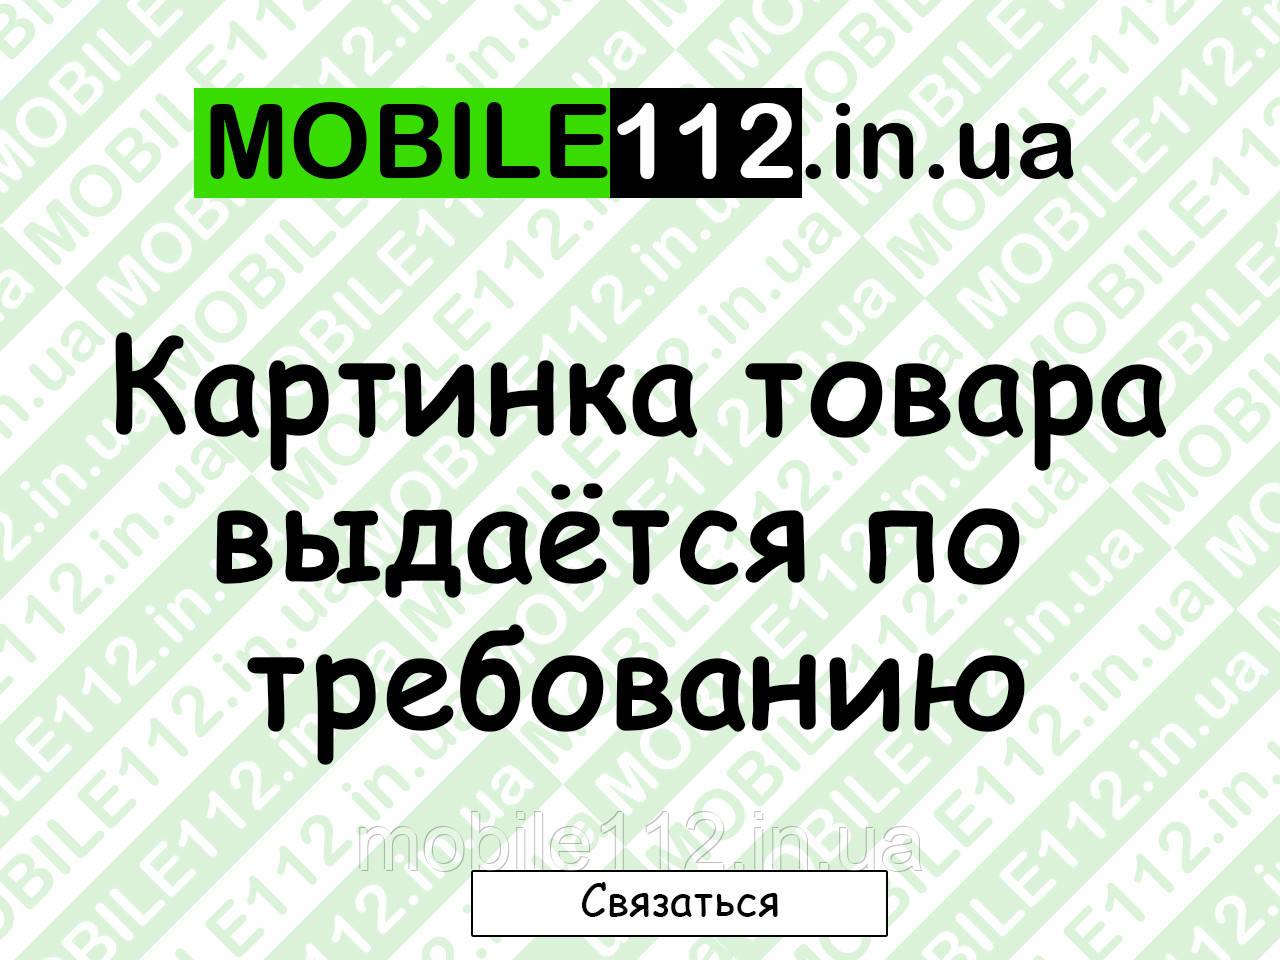 Тачскрин для Nokia 720 Lumia, чёрный, оригинал (Китай) big ic(6mm)/ small ic(5mm)